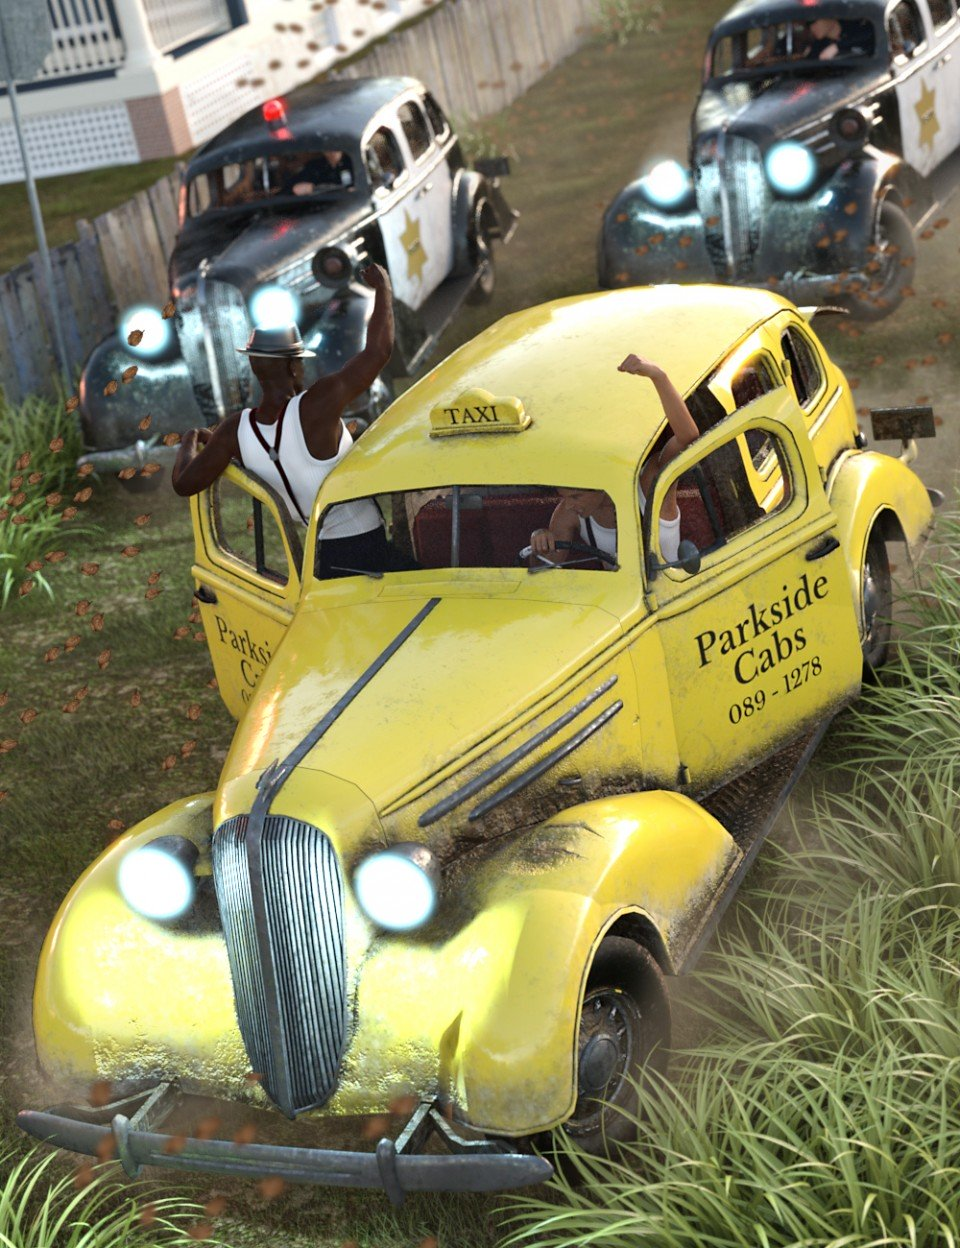 1936 AM Sedan + Cabs 'n' Cops_DAZ3D下载站